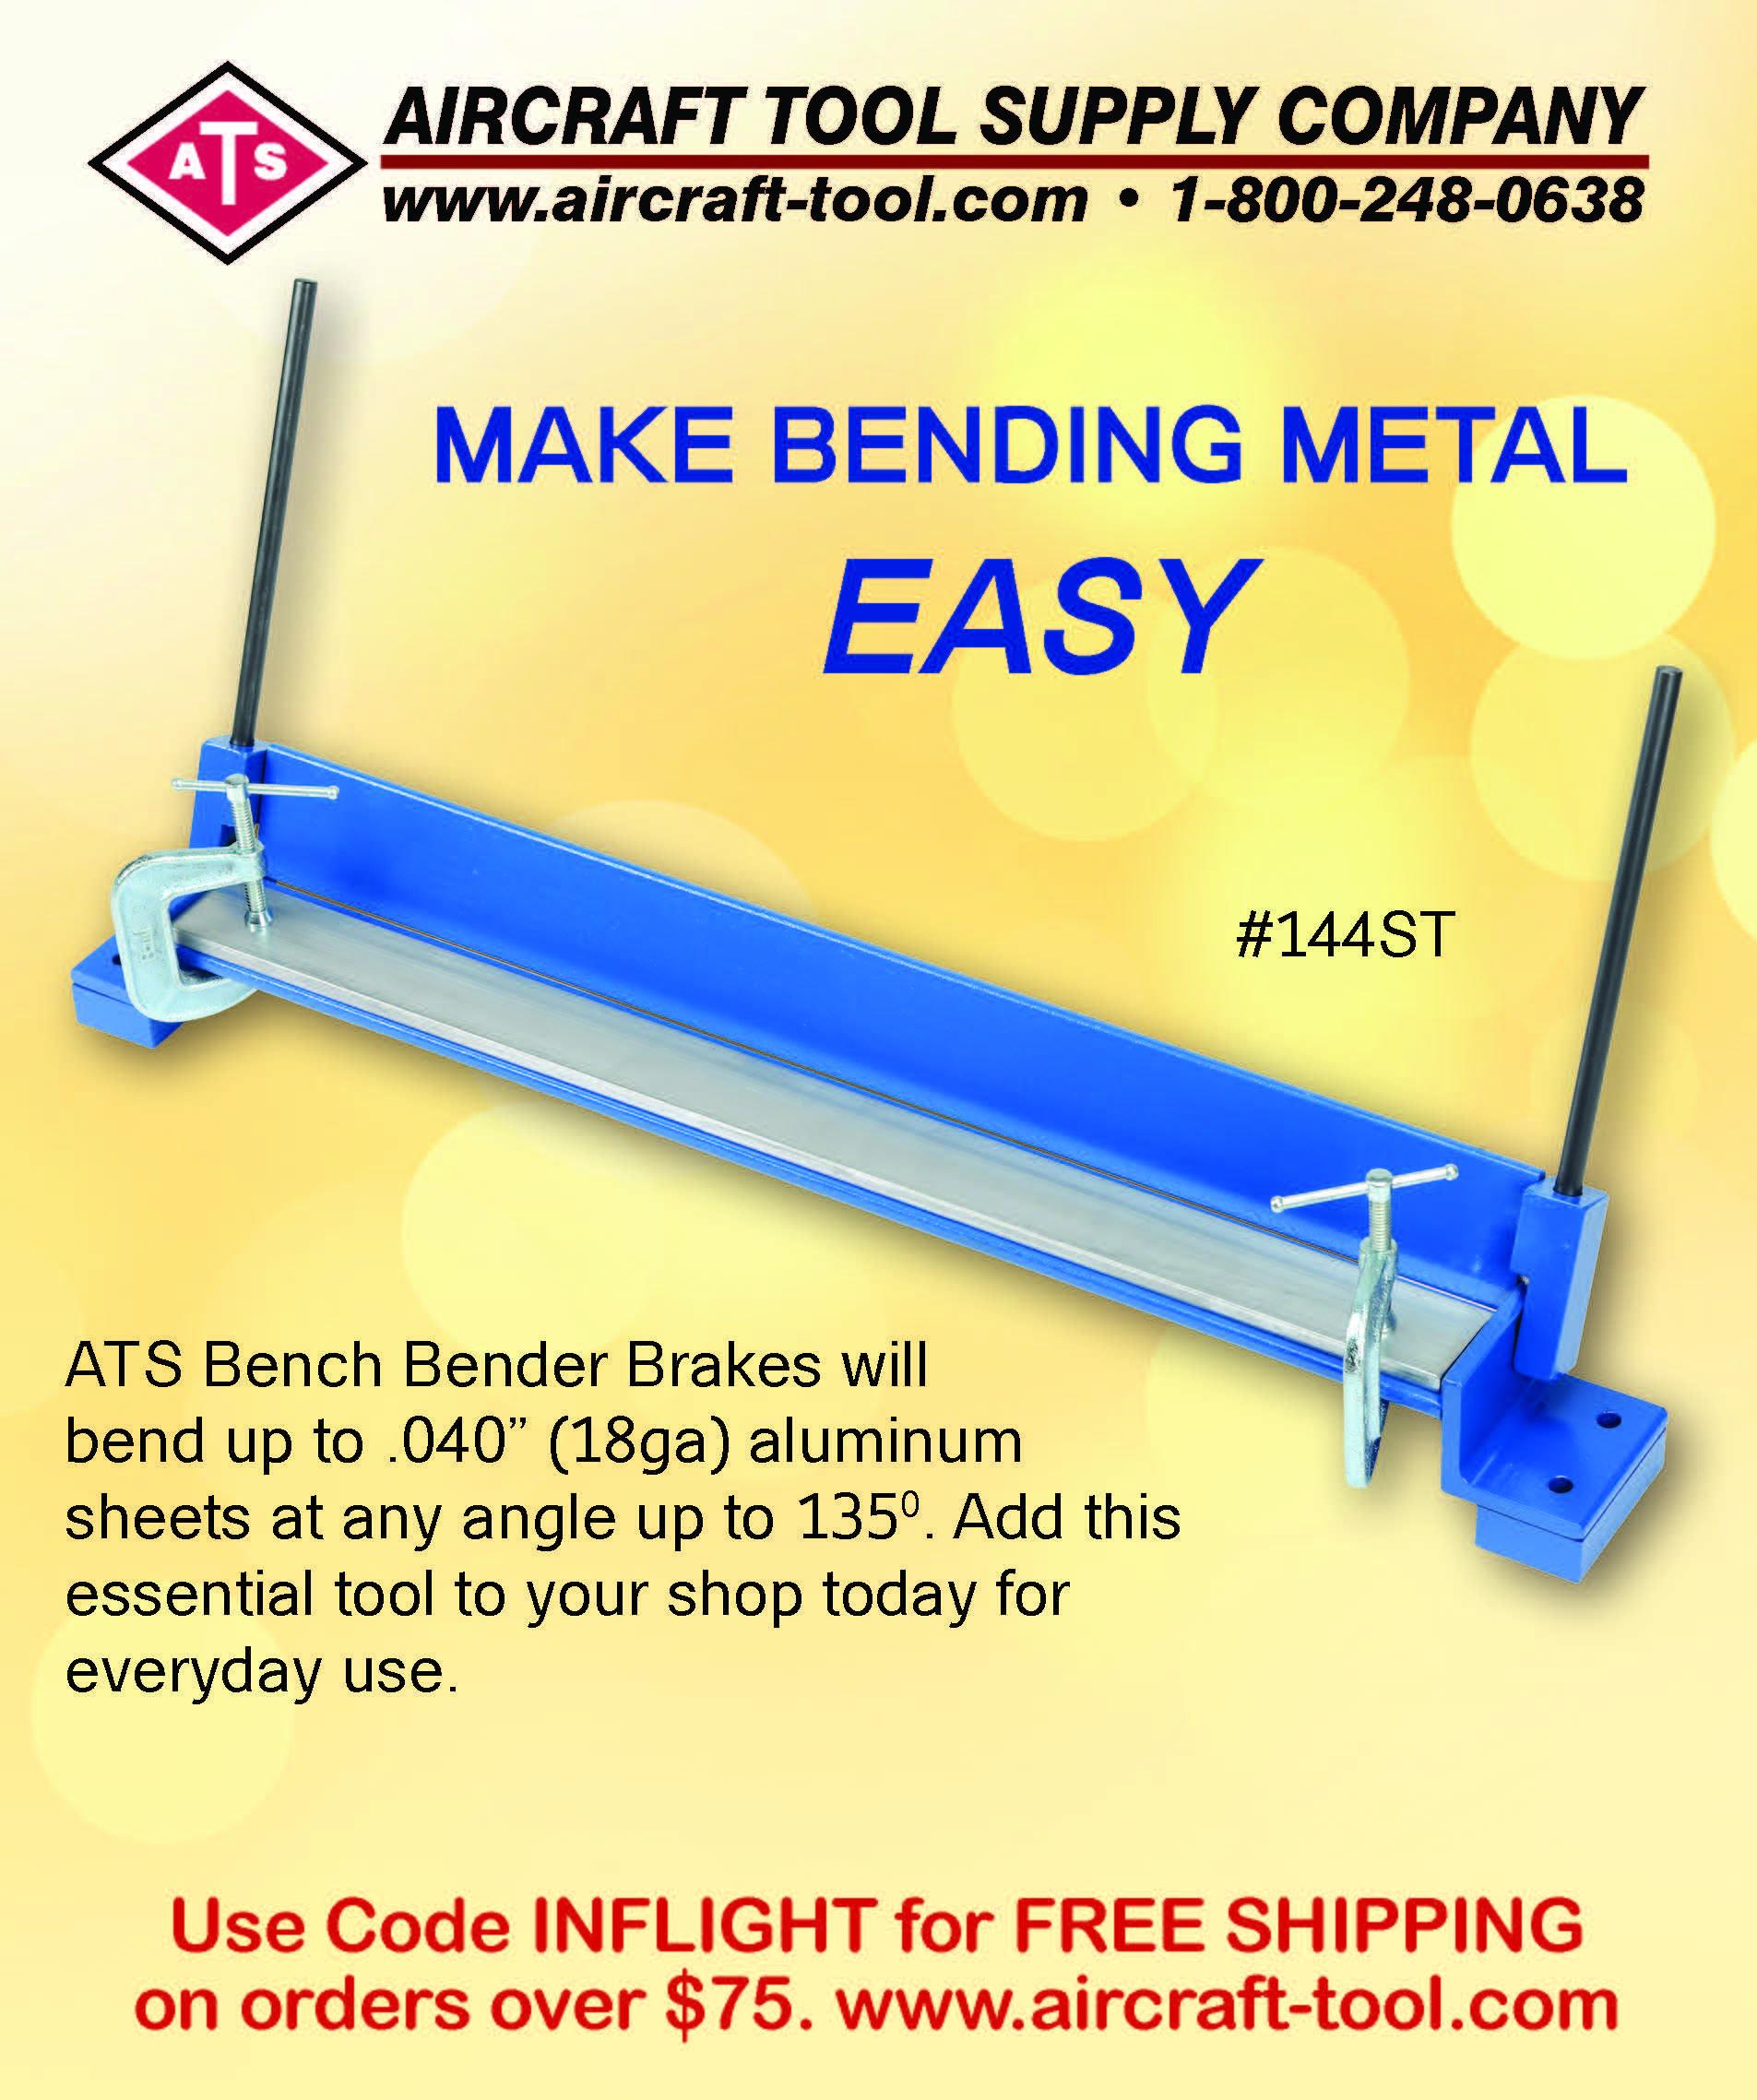 Ats Bench Bender Brake Bends Sheet Metal Www Aircraft Tool Com 1 800 248 0638 Inflight Usa Magazine Tools Tool Supply Aluminum Sheets